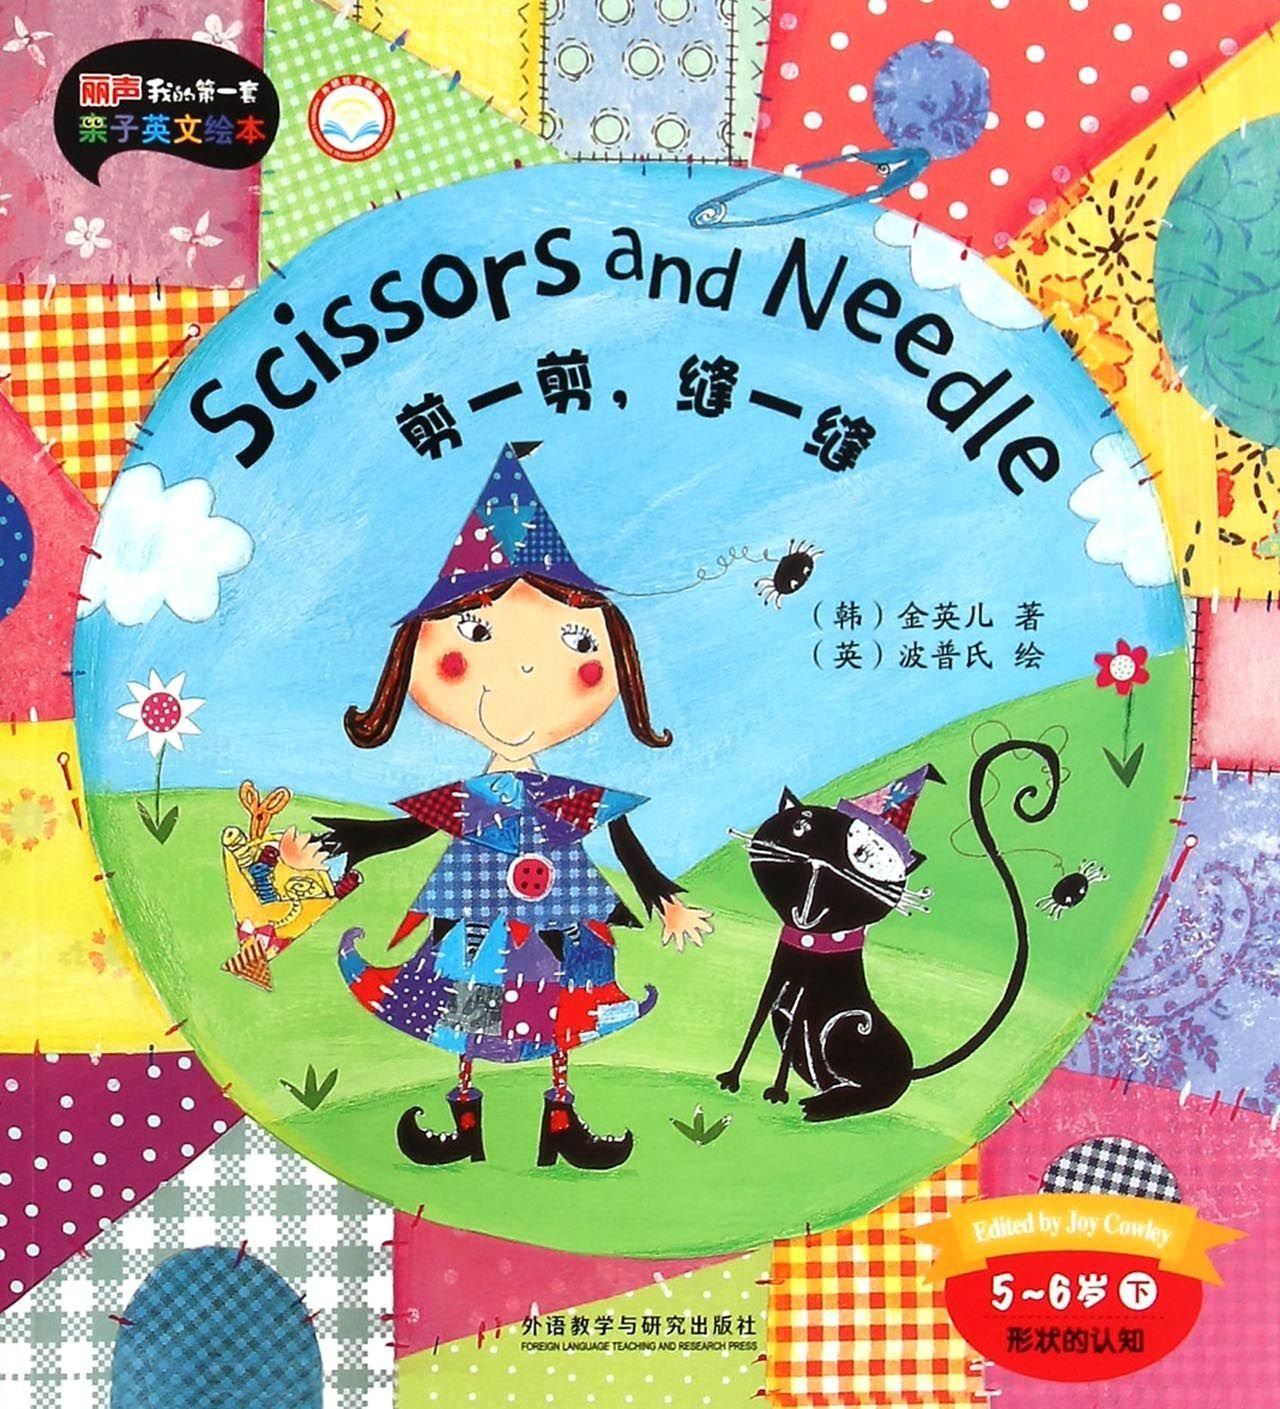 Download 外研社英语分级阅读·丽声我的第一套亲子英文绘本:剪一剪·缝一缝(5-6岁)(下)(点读版) ebook